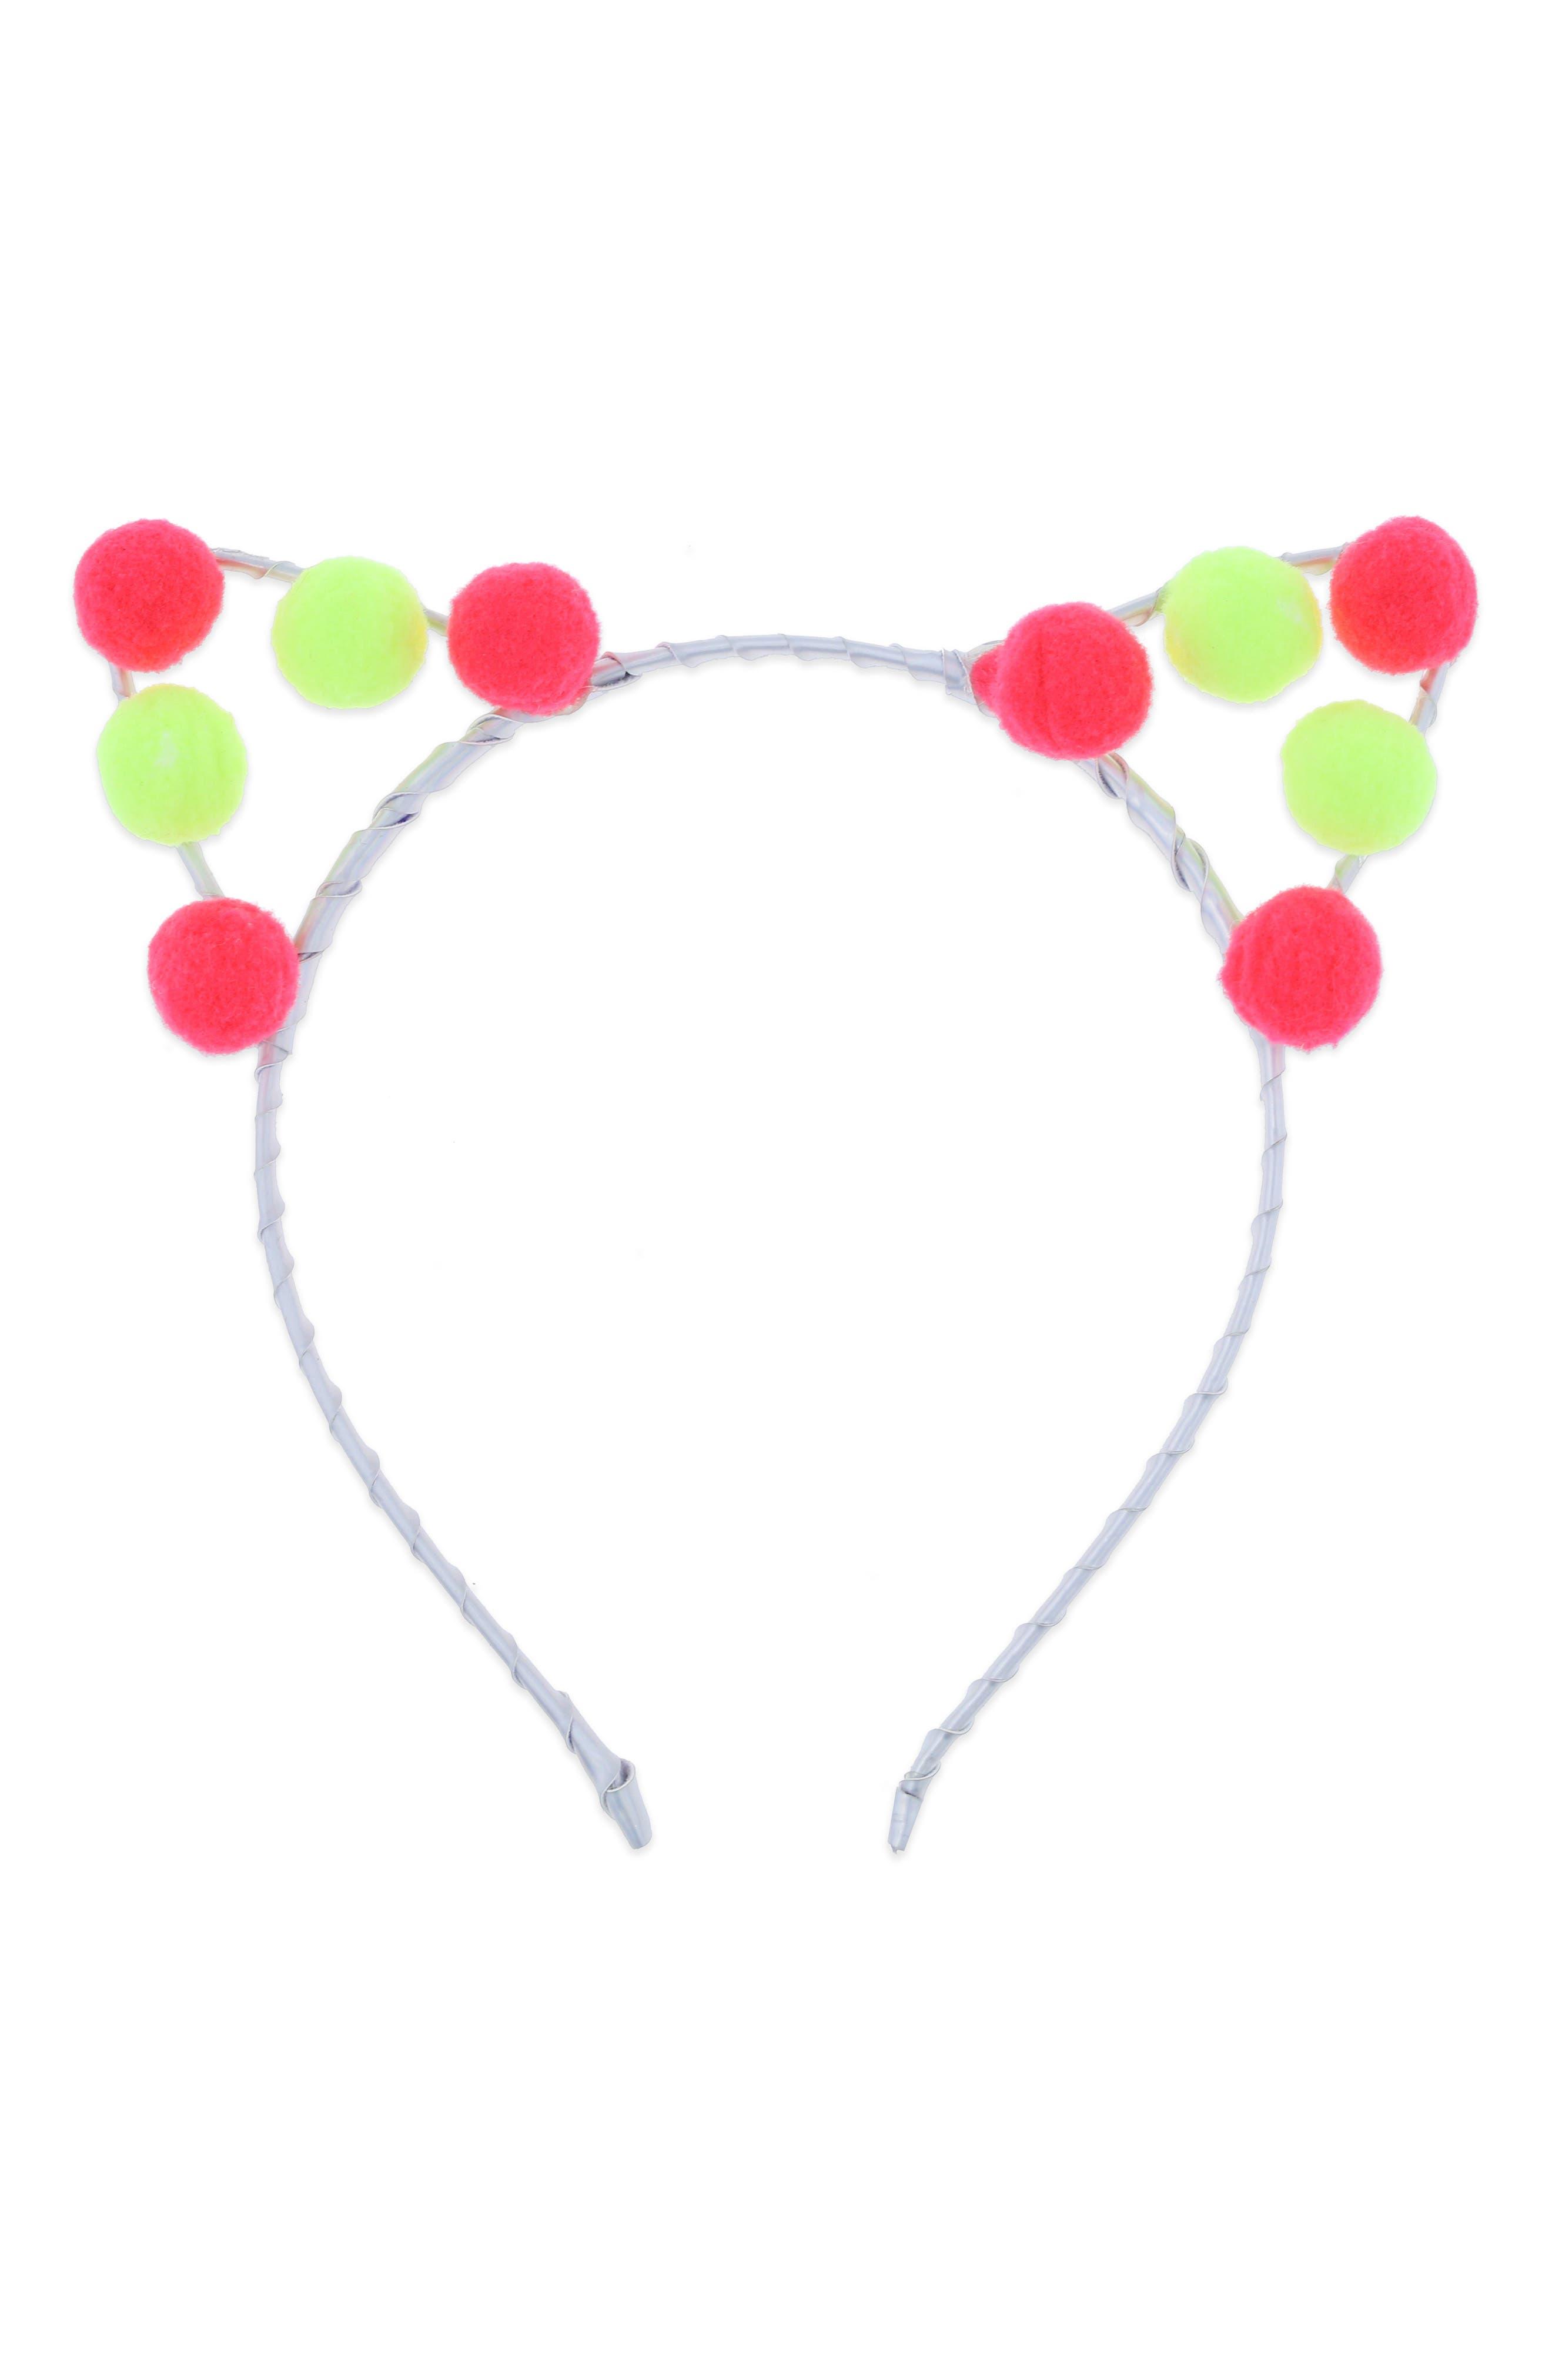 Alternate Image 1 Selected - Capelli New York Pompom Cat Ear Headband (Girls)